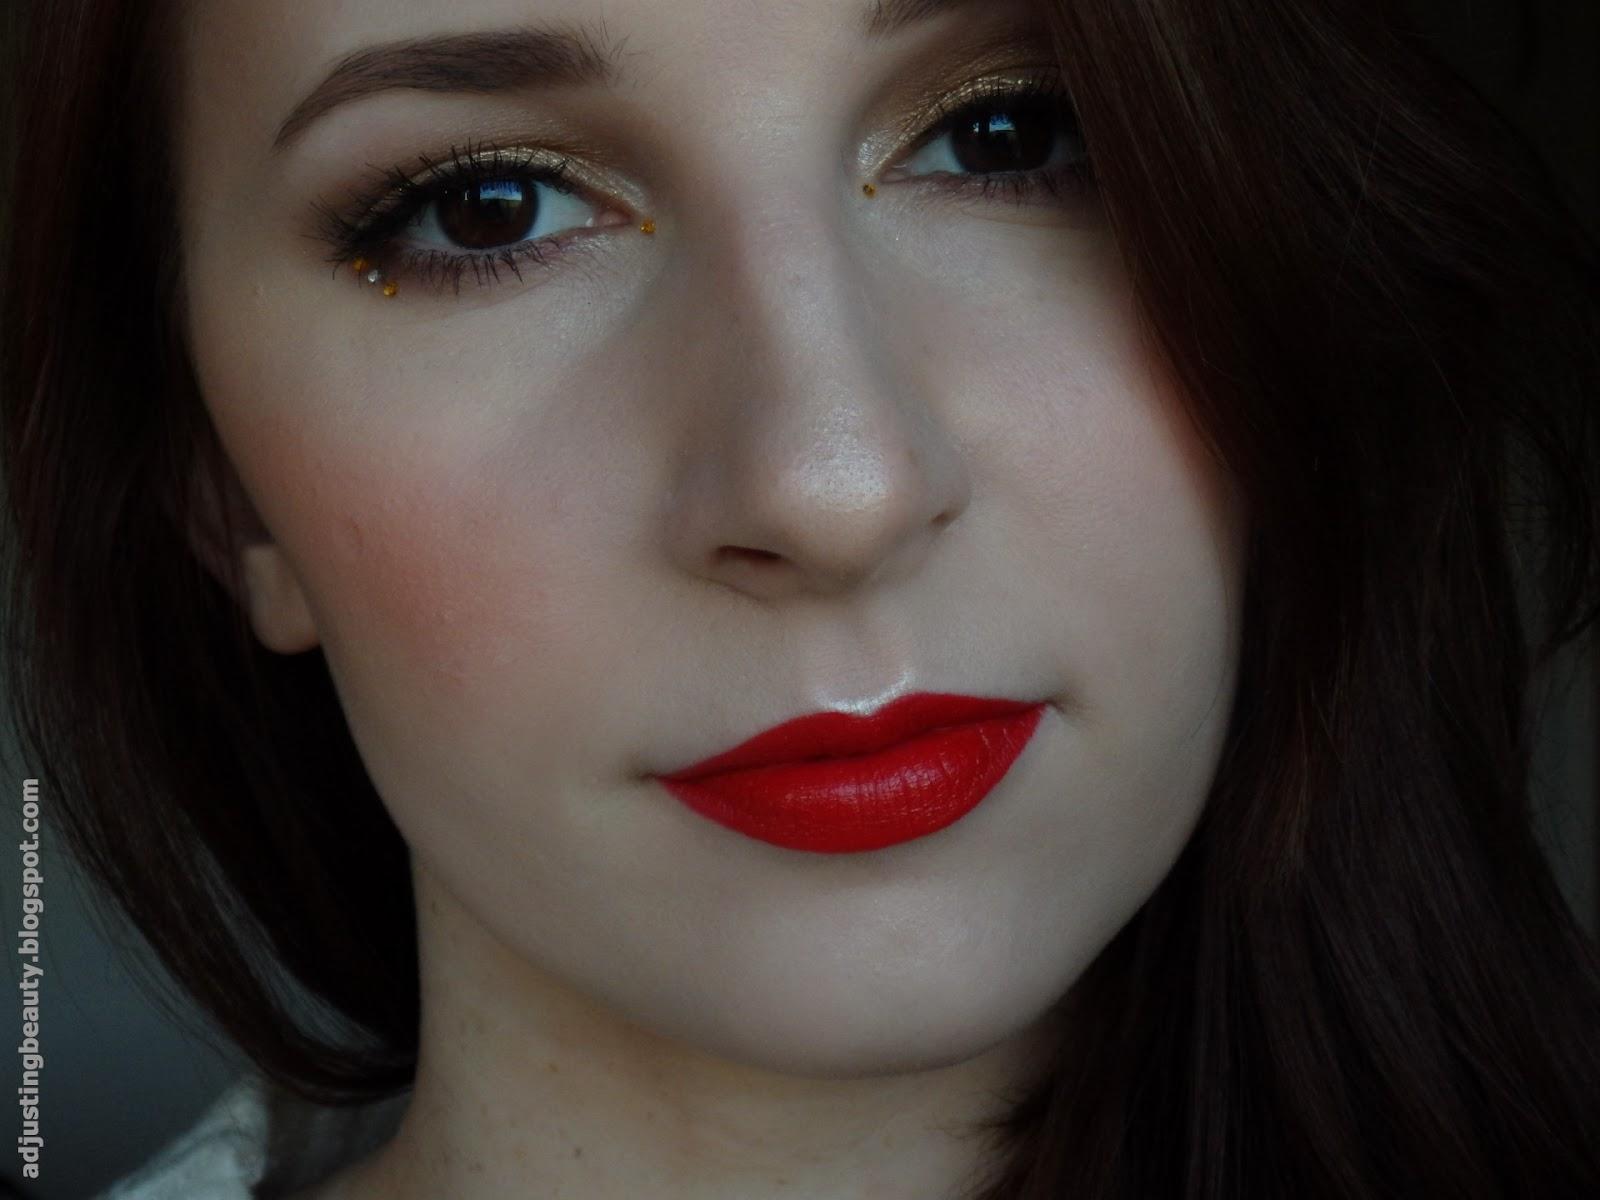 Marsala Inspired Makeup - Adjusting Beauty